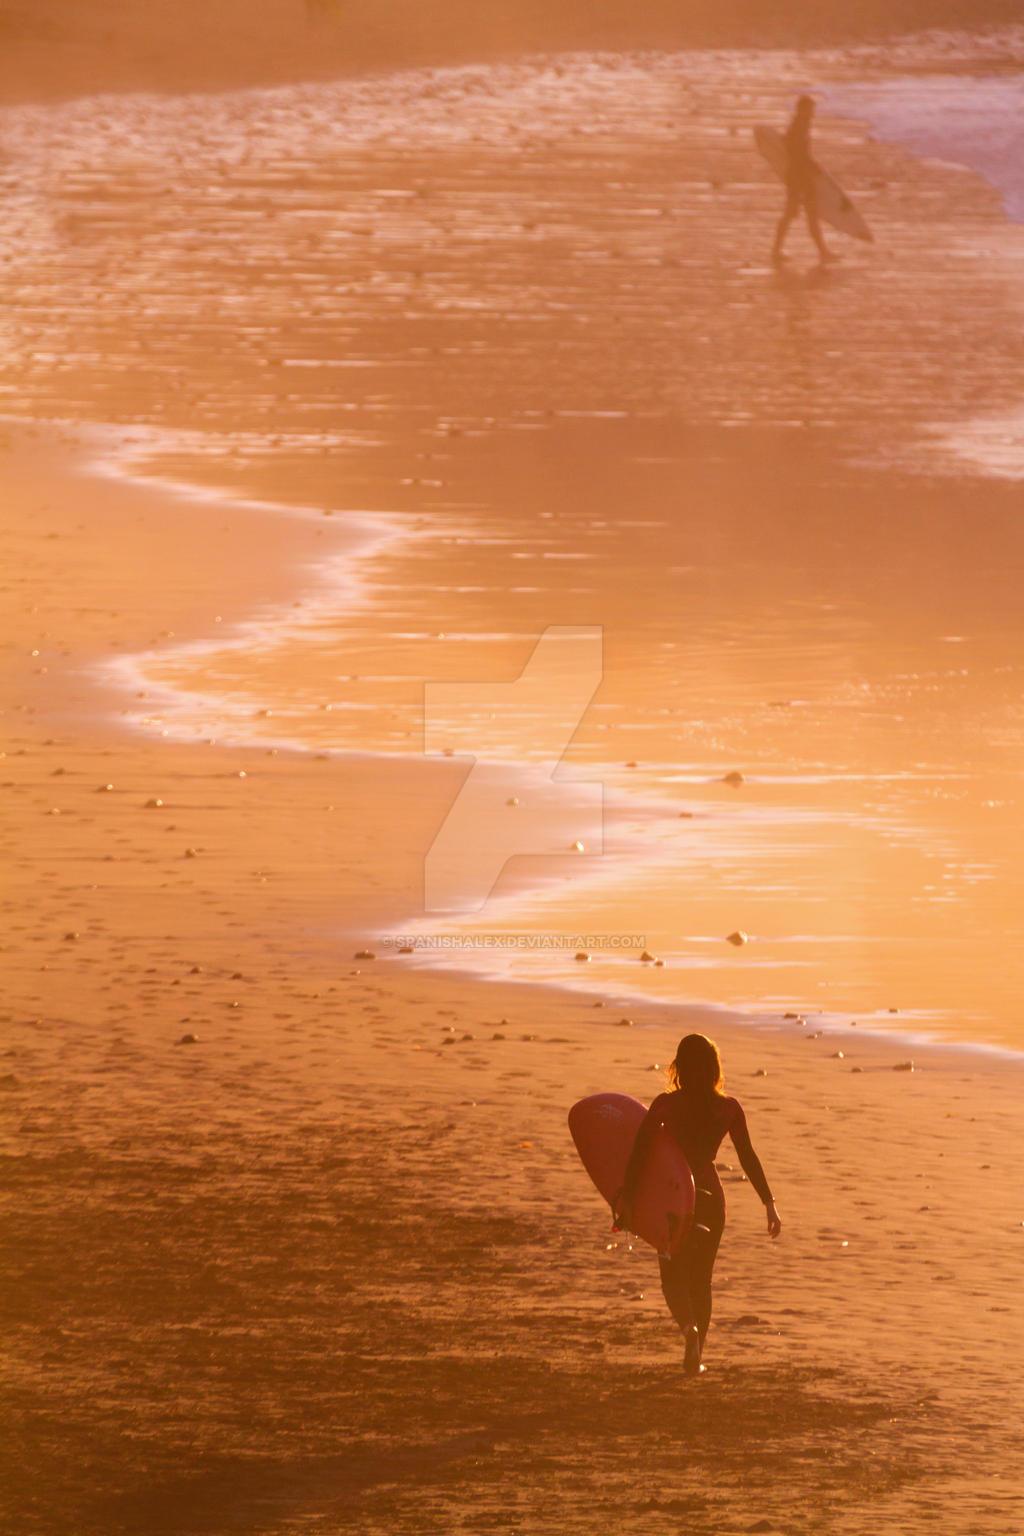 Sunset Surfer Girl Silhouette by Spanishalex